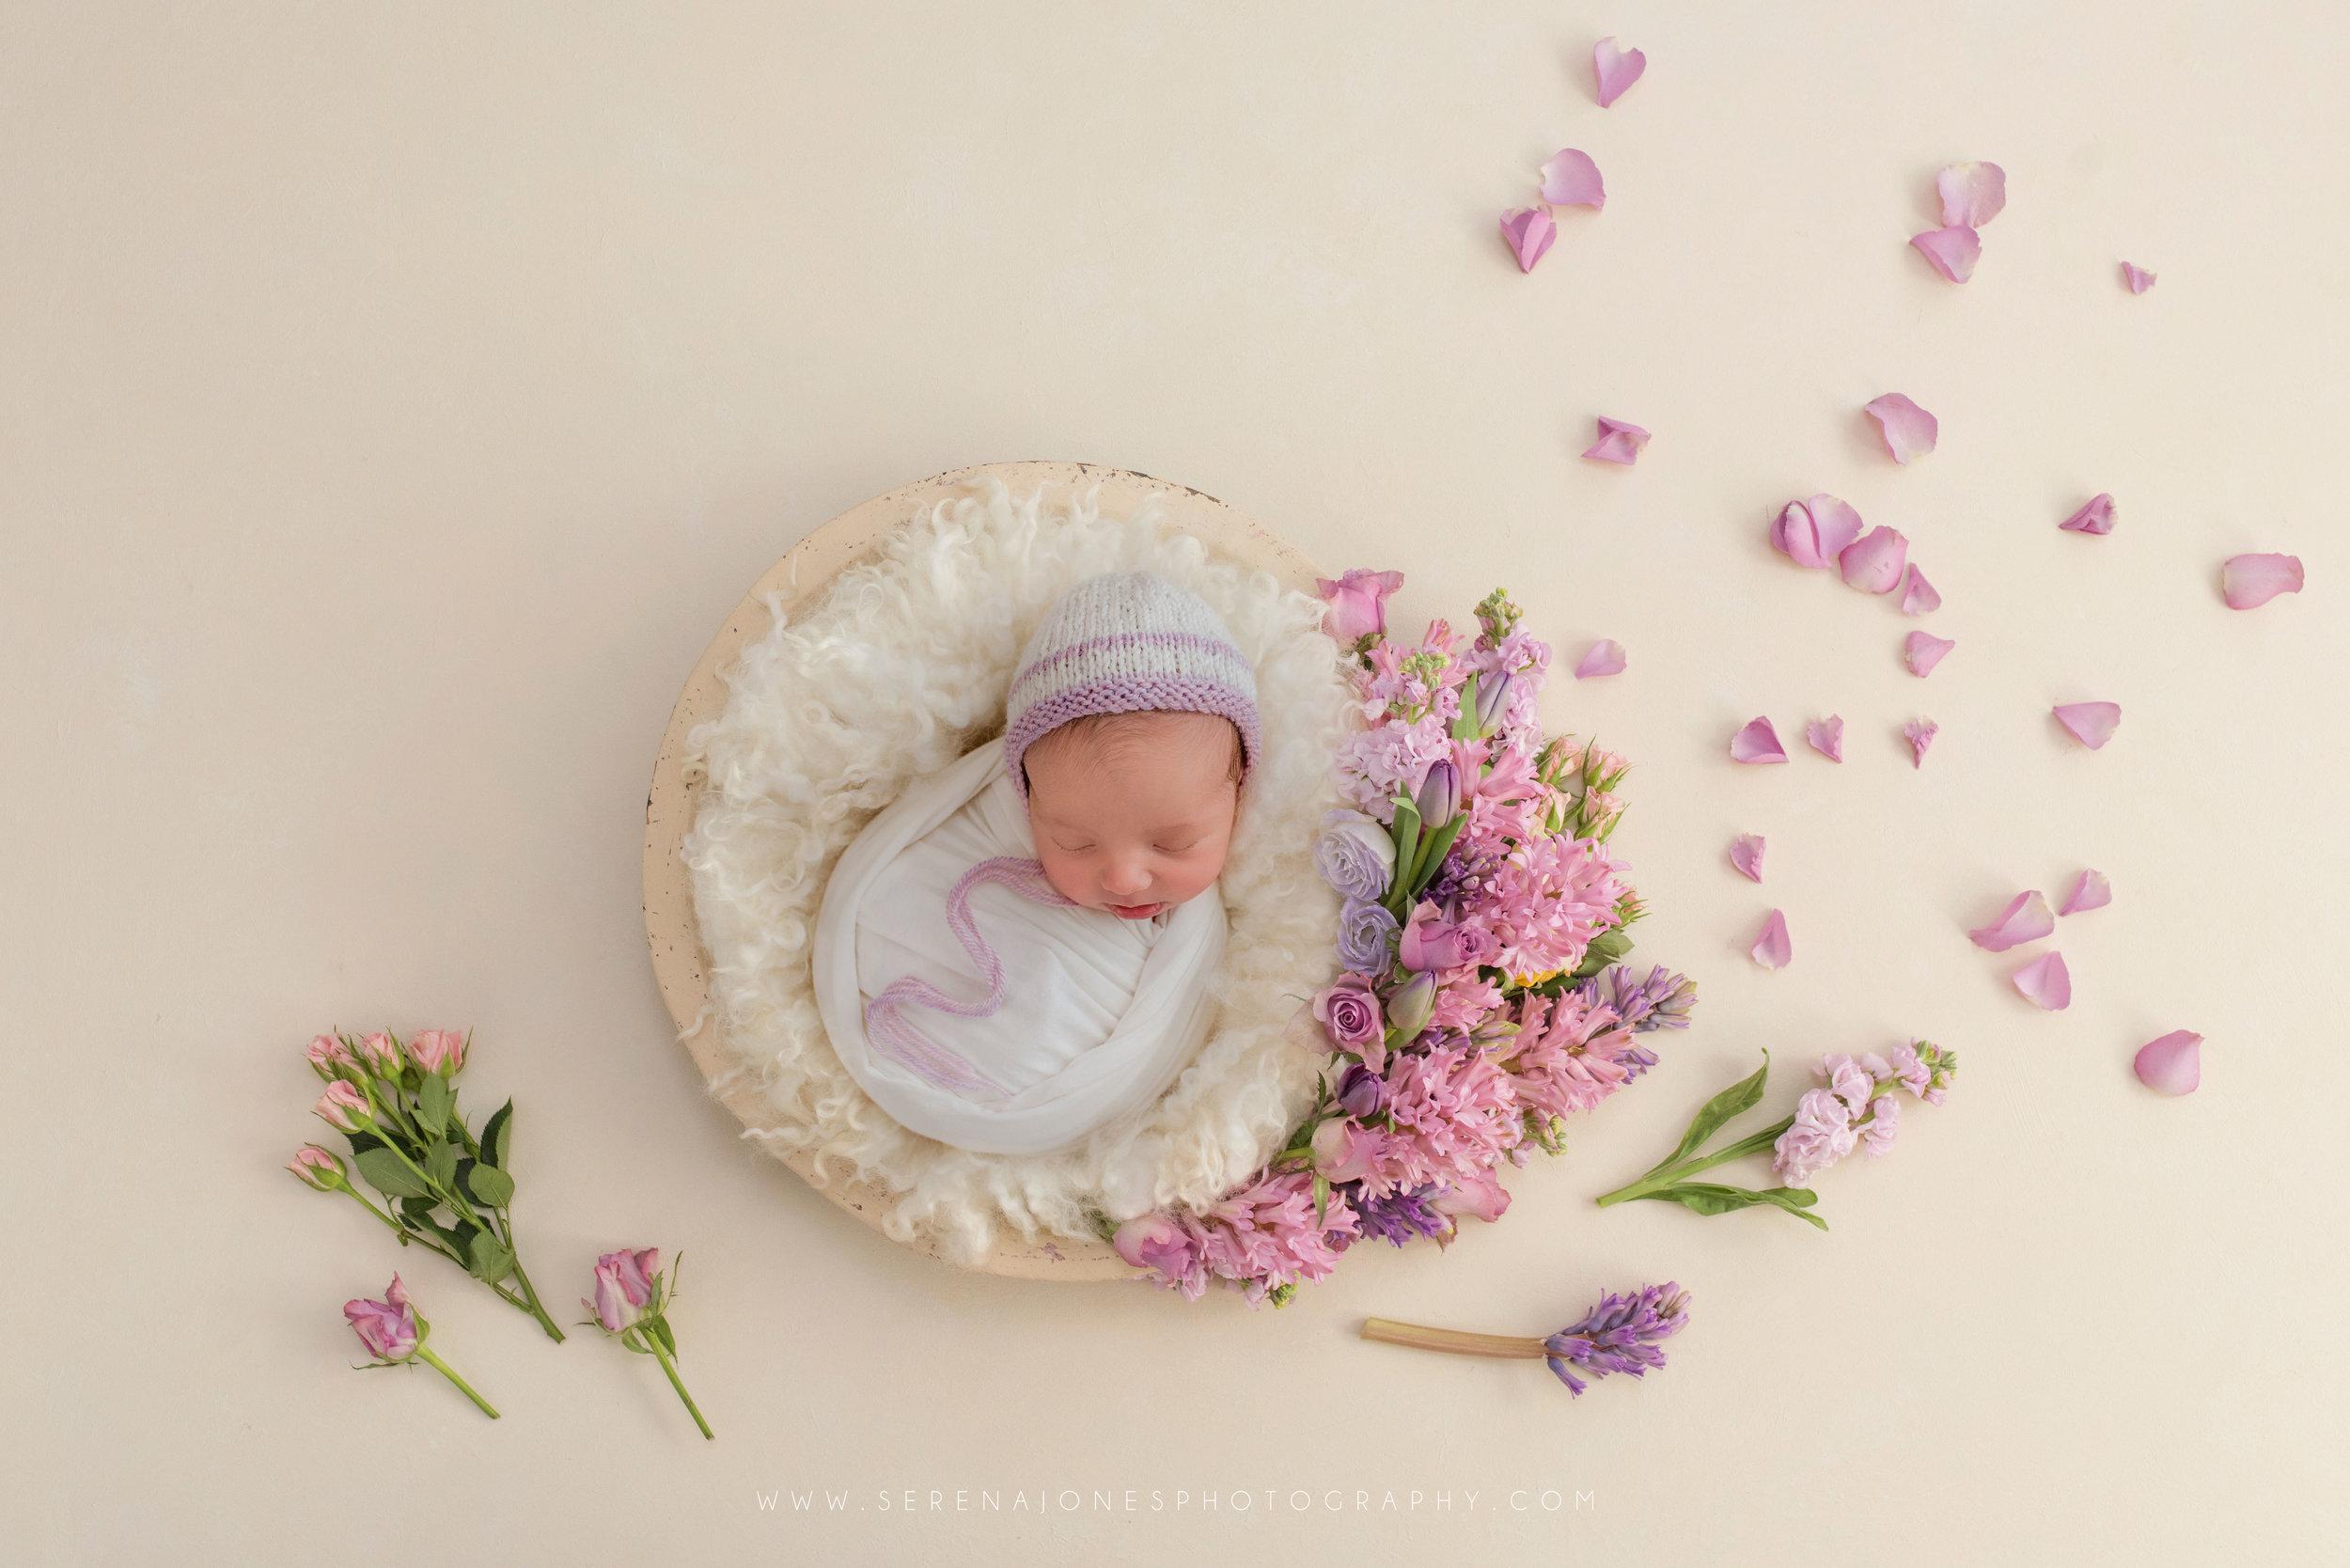 Serena Jones Photography - Alexandra Rose Nardo - 8.jpg